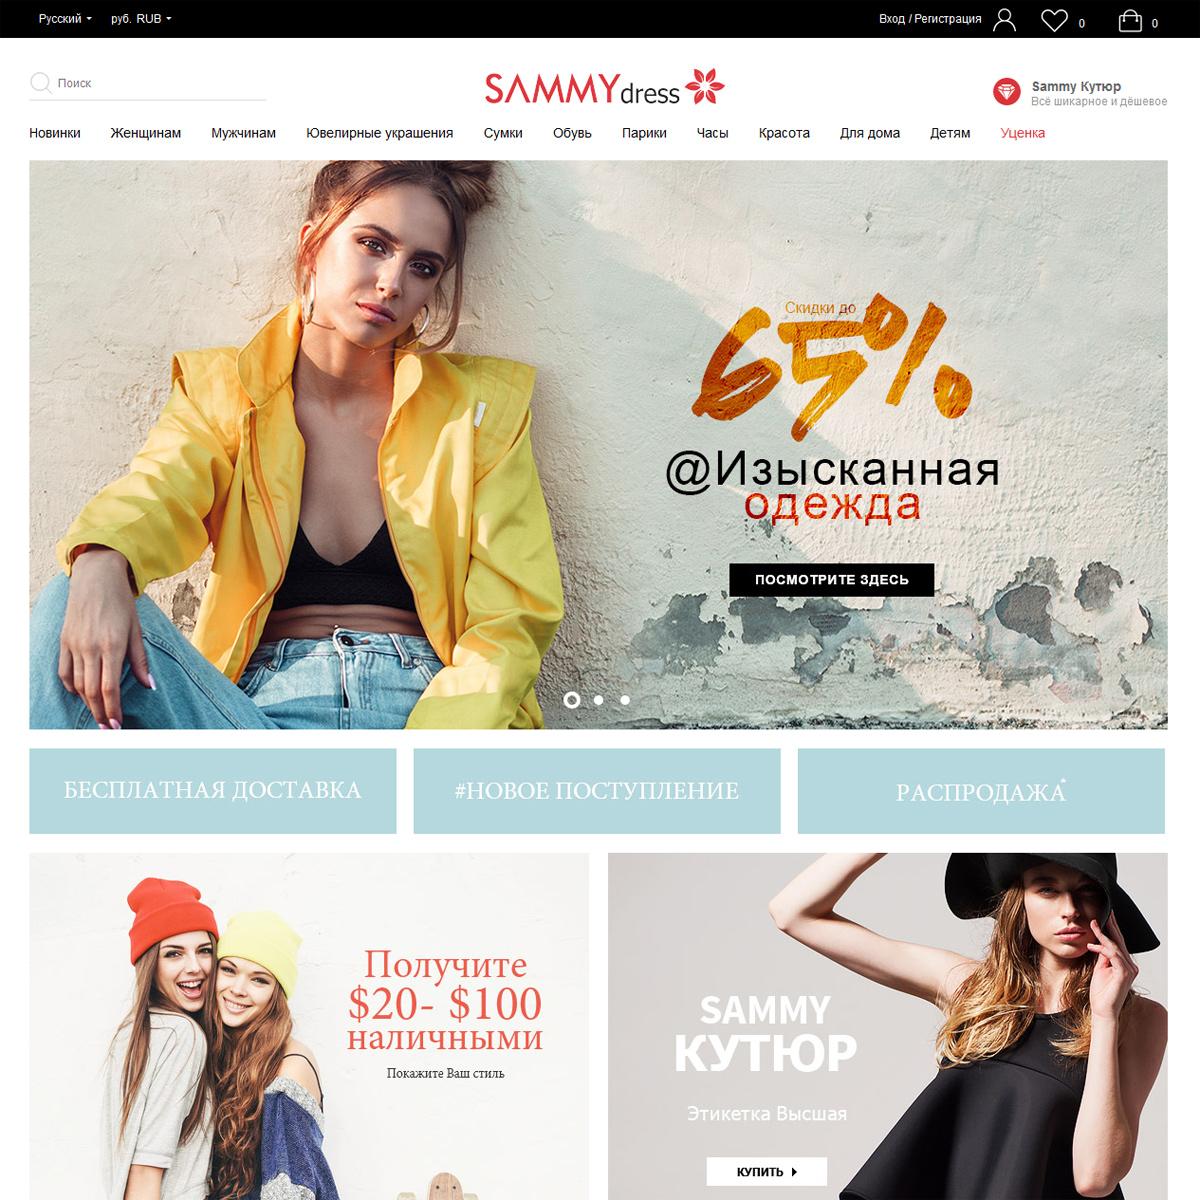 Интернет магазин Sammydress